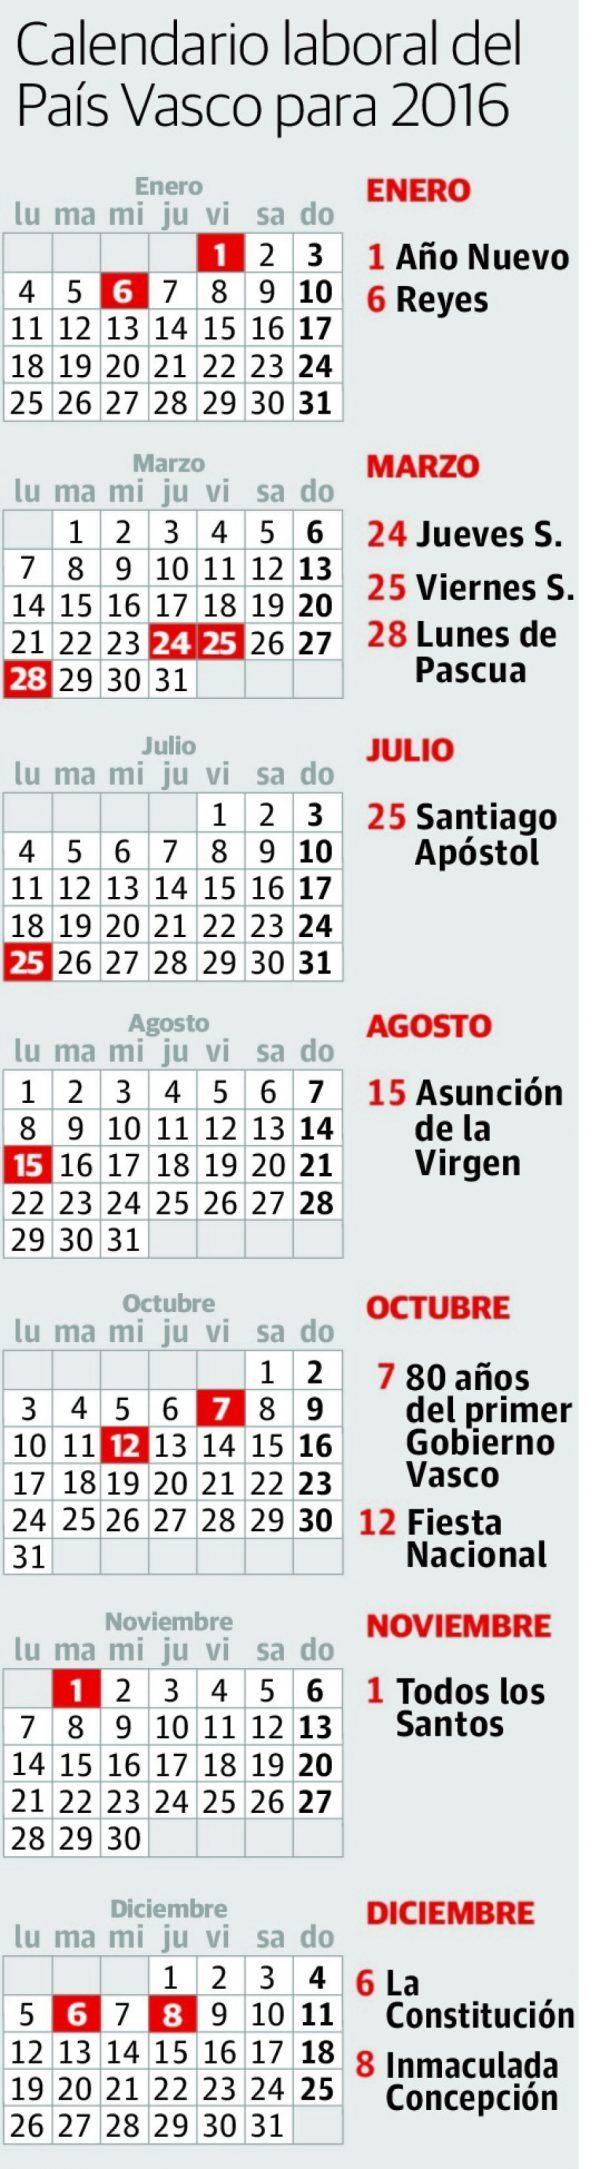 calendario-laboral-2016-pais-vasco